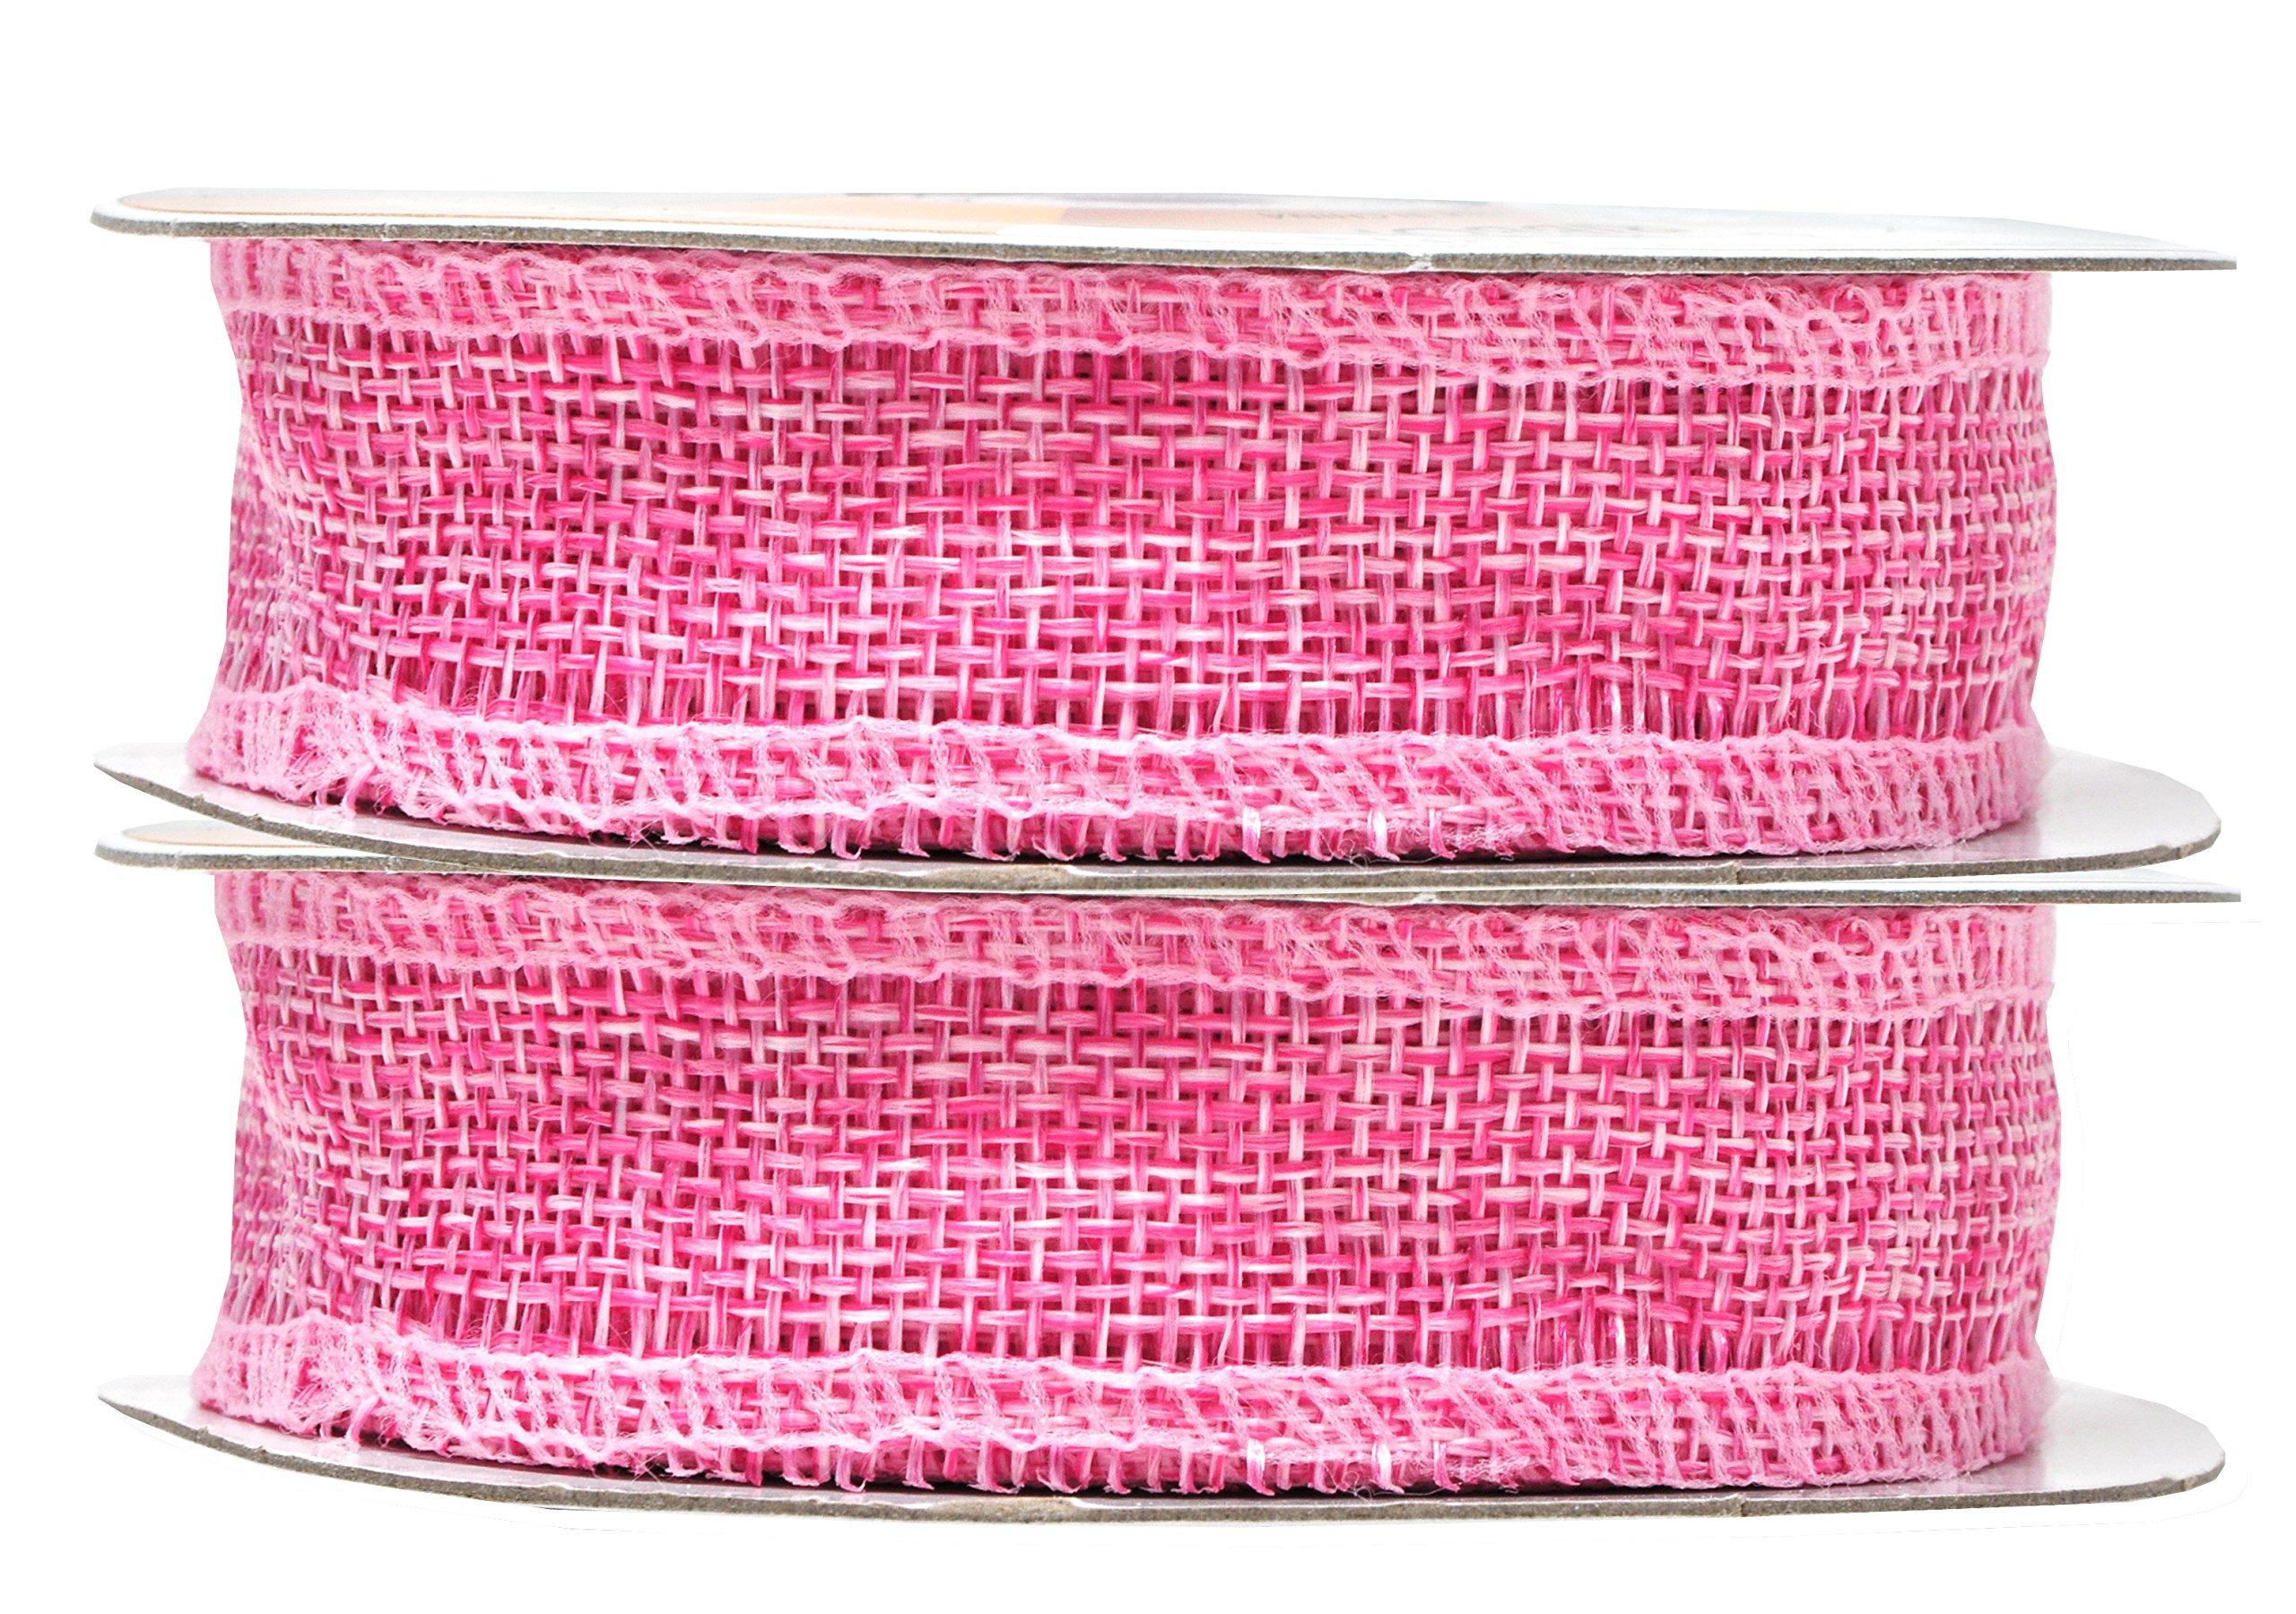 Pink Burlap Ribbon 1 Inch 2 Rolls 20 Yards Unwired Rustic Jute Ribbon for Crafts, Mason Jars, Weddings, Party Decoration; by Mandala Crafts